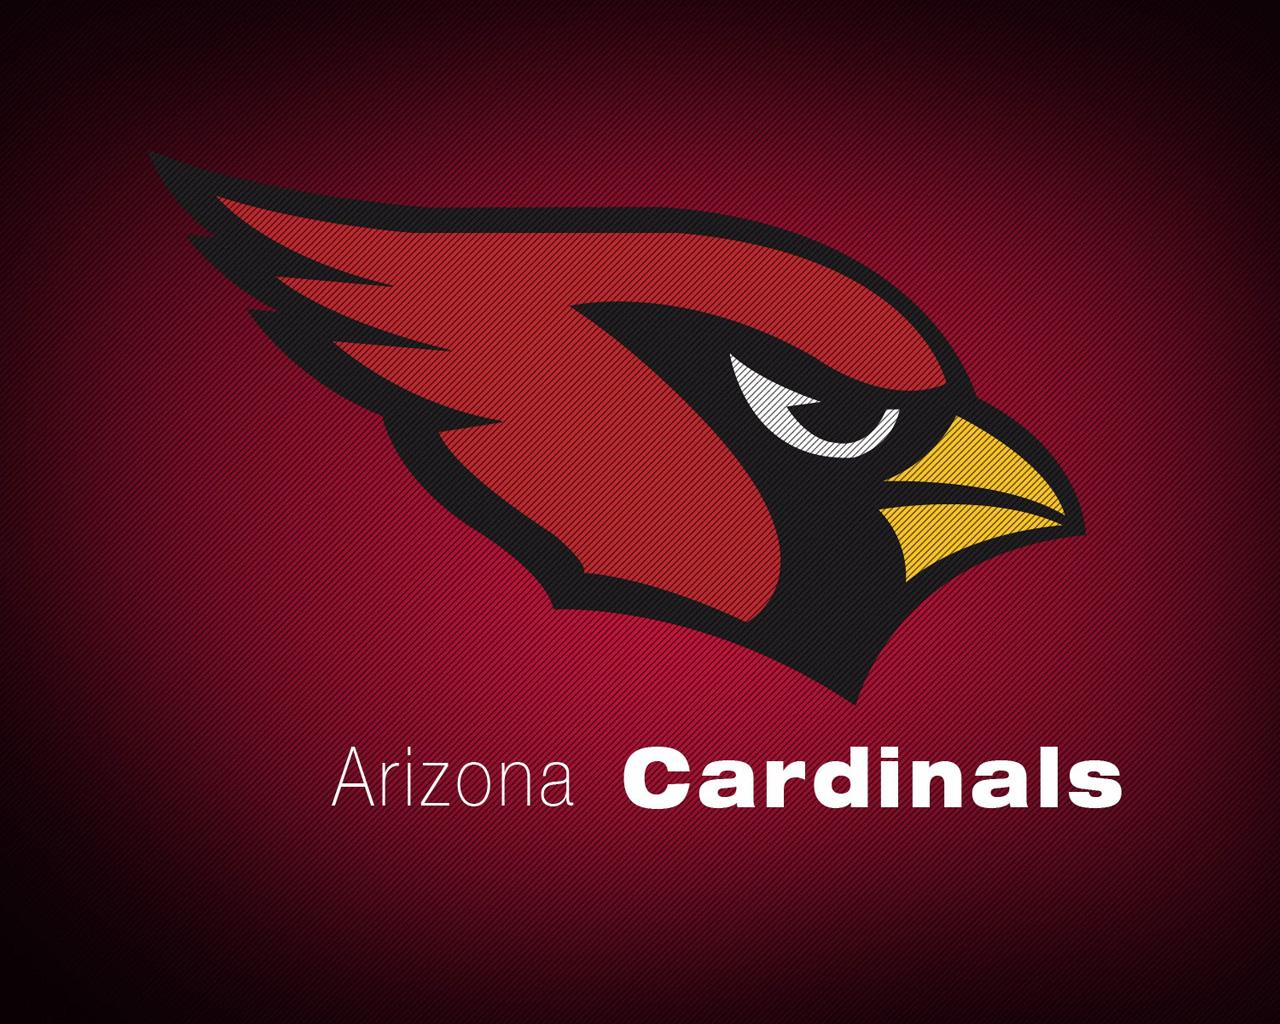 buy arizona cardinals tickets